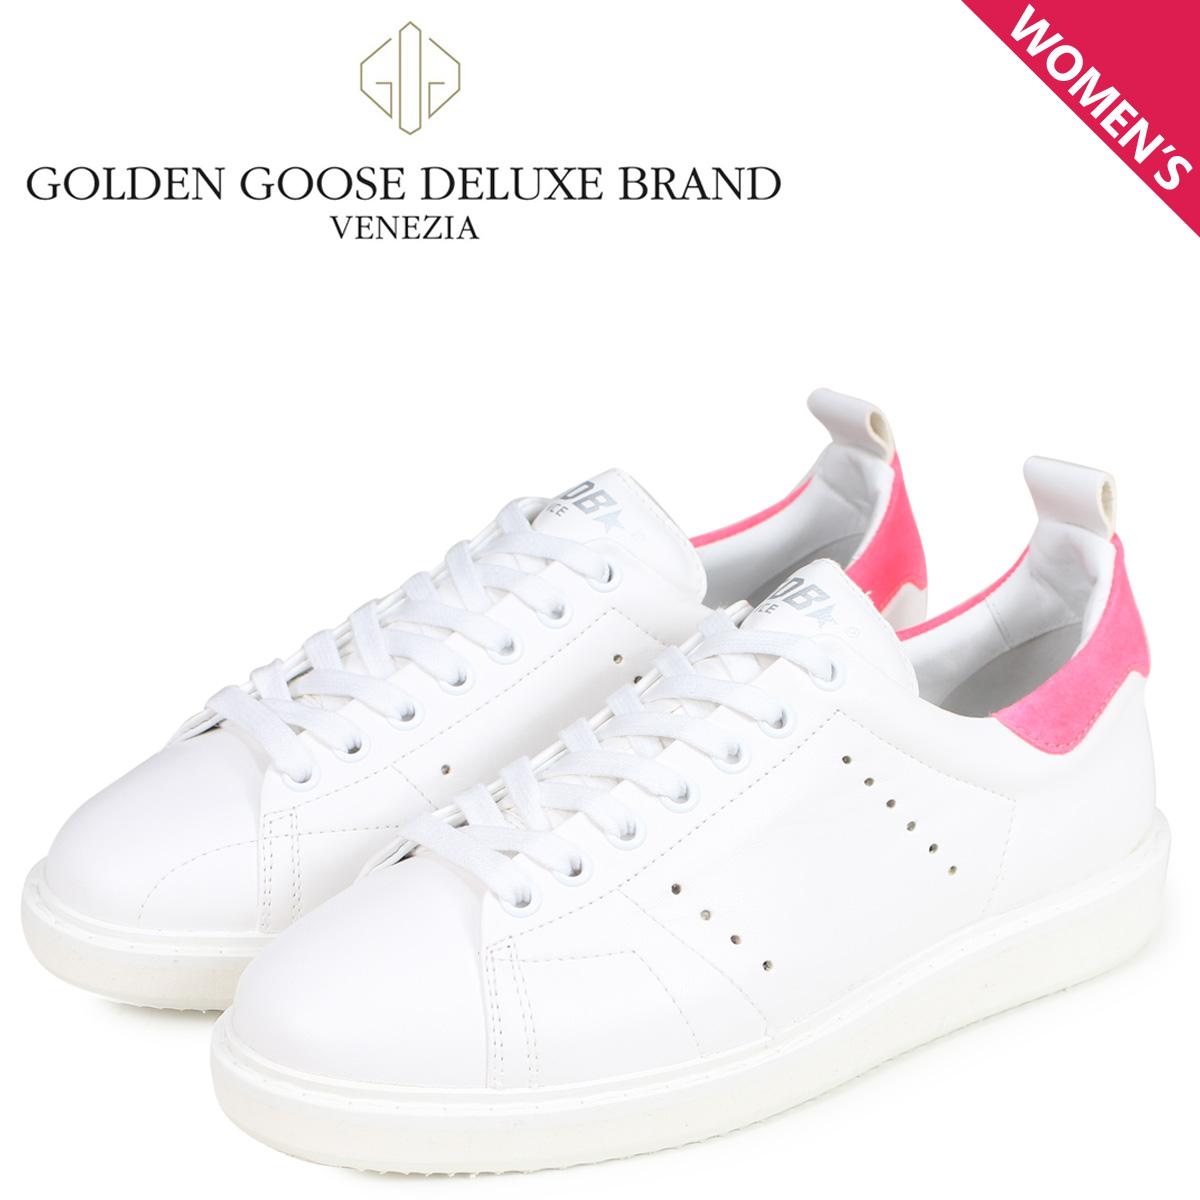 Golden Goose ゴールデングース スーパースター スニーカー レディース SNEAKERS SUPERSTAR ホワイト 白 G34WS631 P4